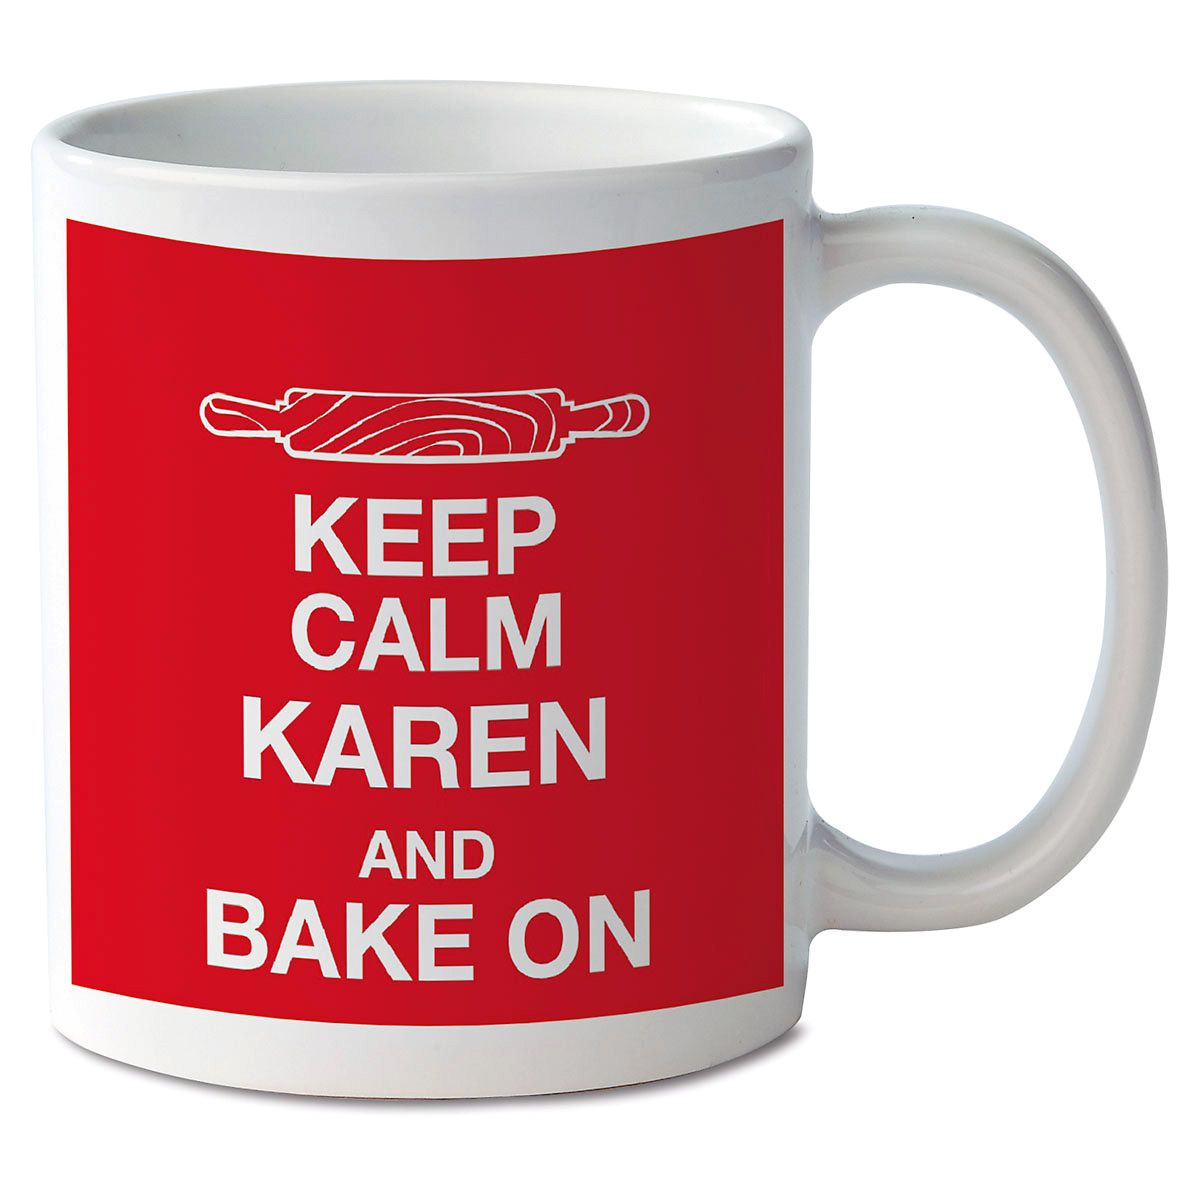 Keep Calm and Bake On Personalized Mug